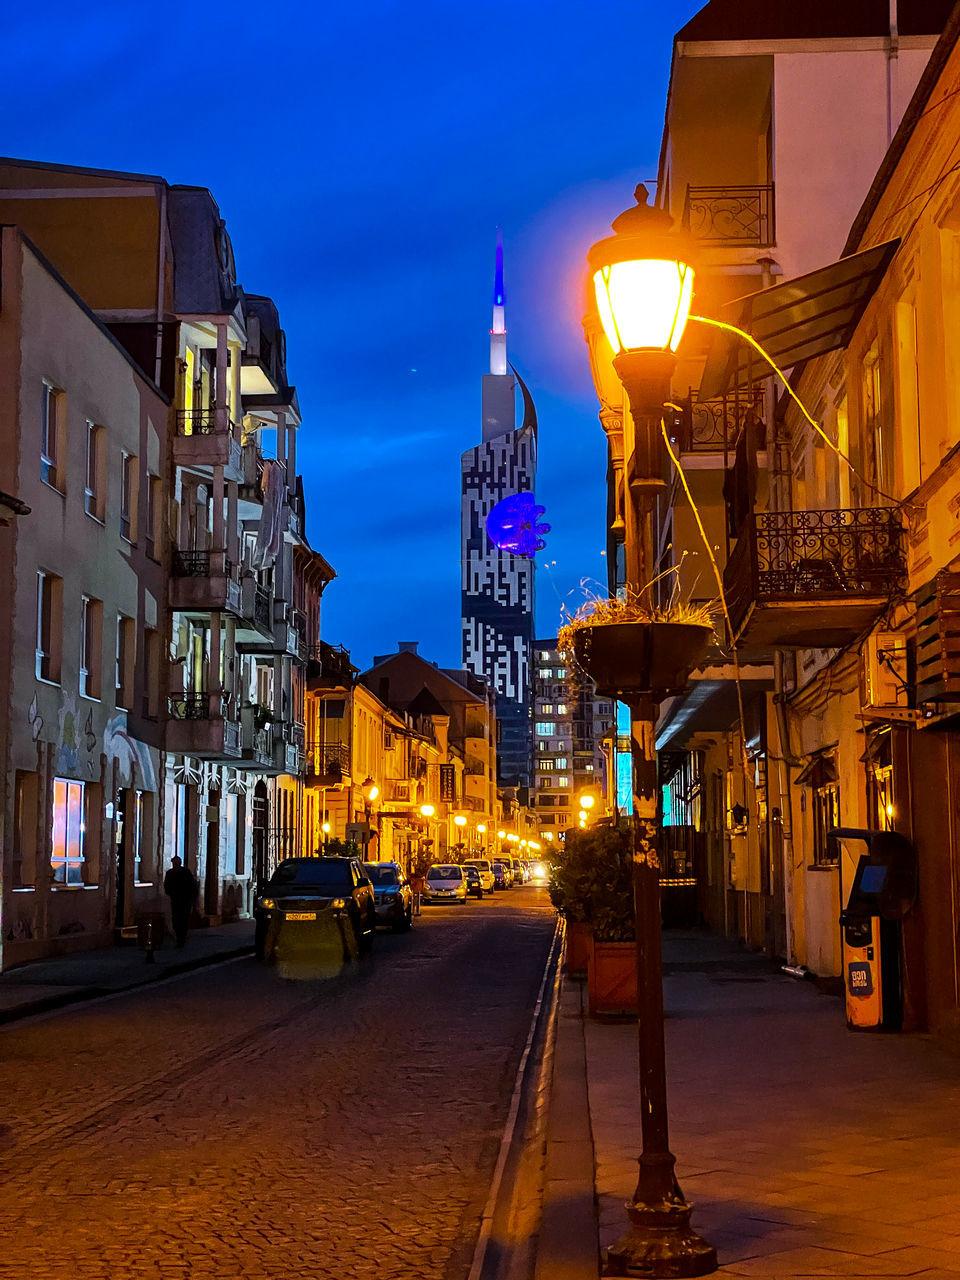 ILLUMINATED CITY STREET BY BUILDINGS AT NIGHT